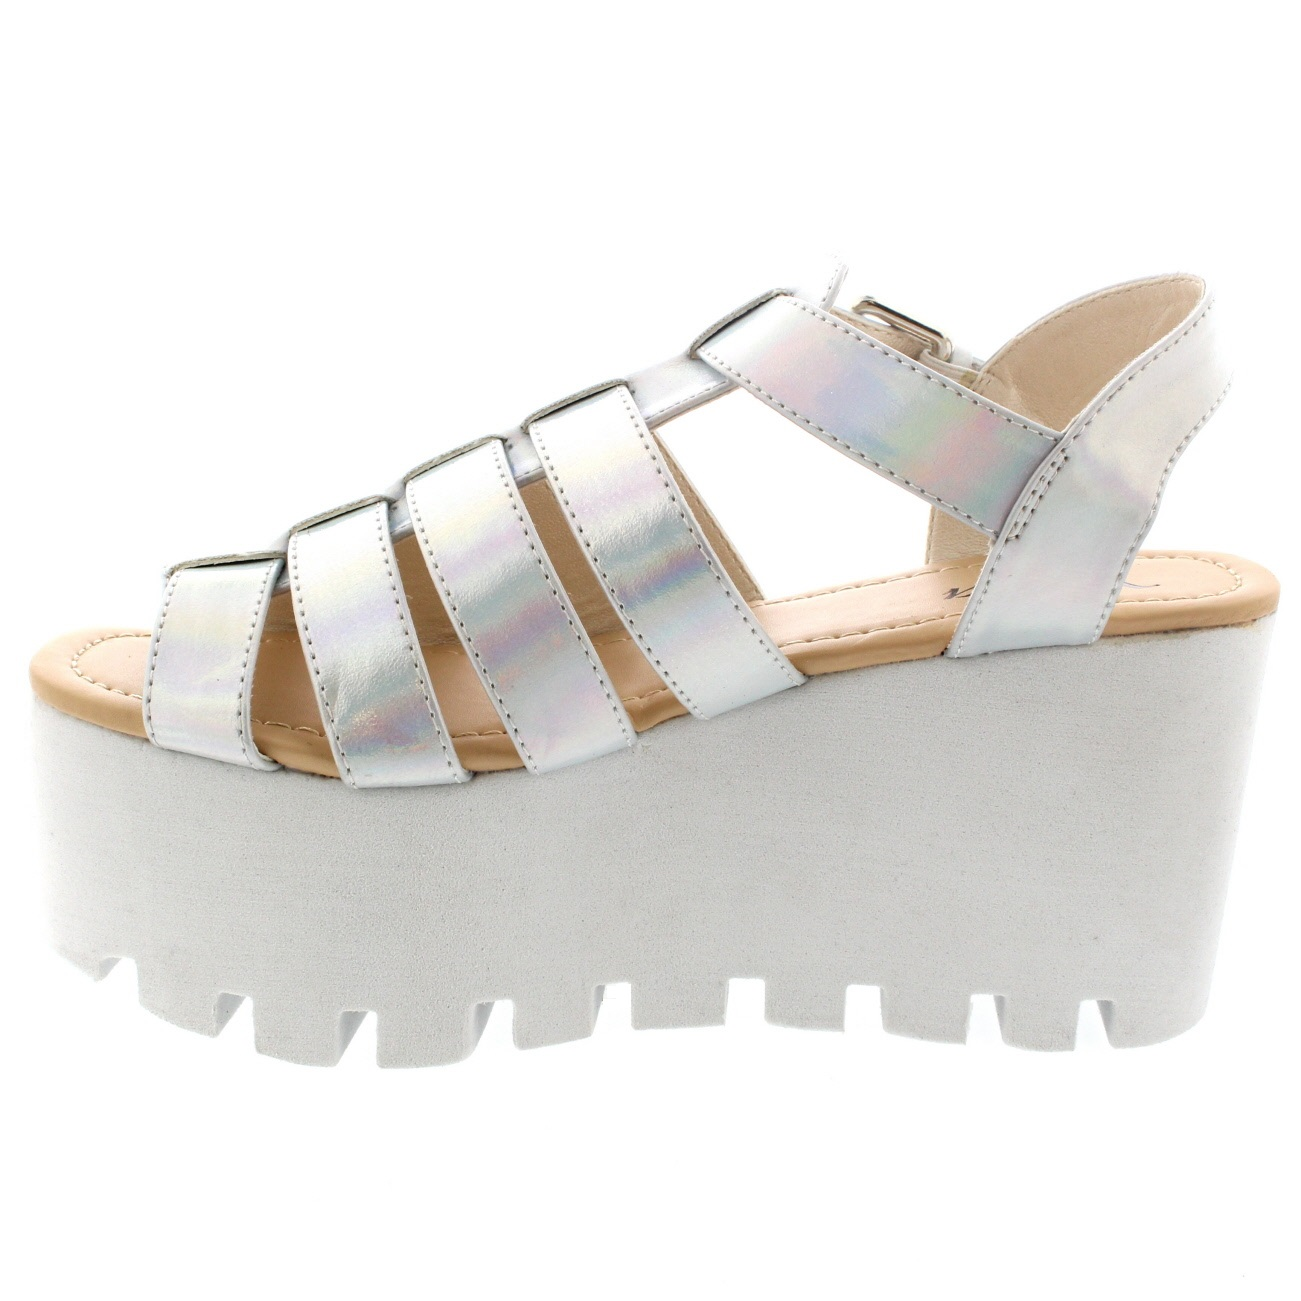 e0db794bf0a Ladies Buckle Hologram Flatform Shoes Platform Gladiator Wedge ...